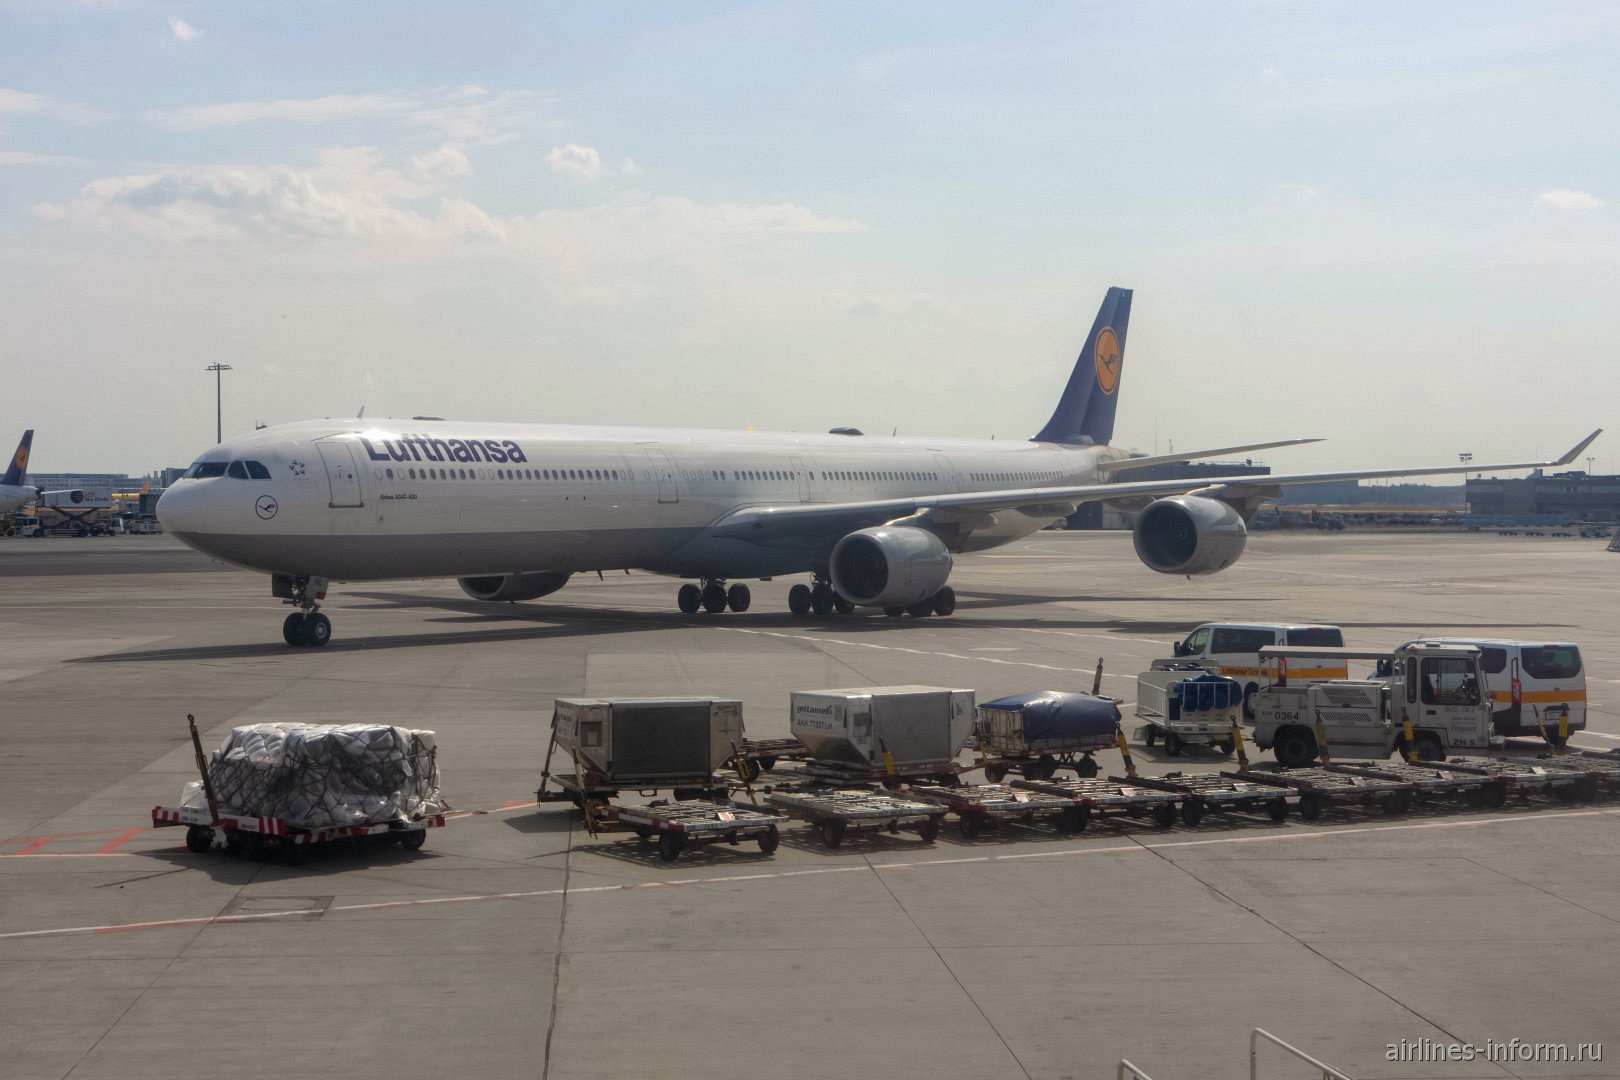 Авиалайнер Airbus A340-600 (D-AIHL) авиакомпании Lufthansa в аэропорту Франкфурта